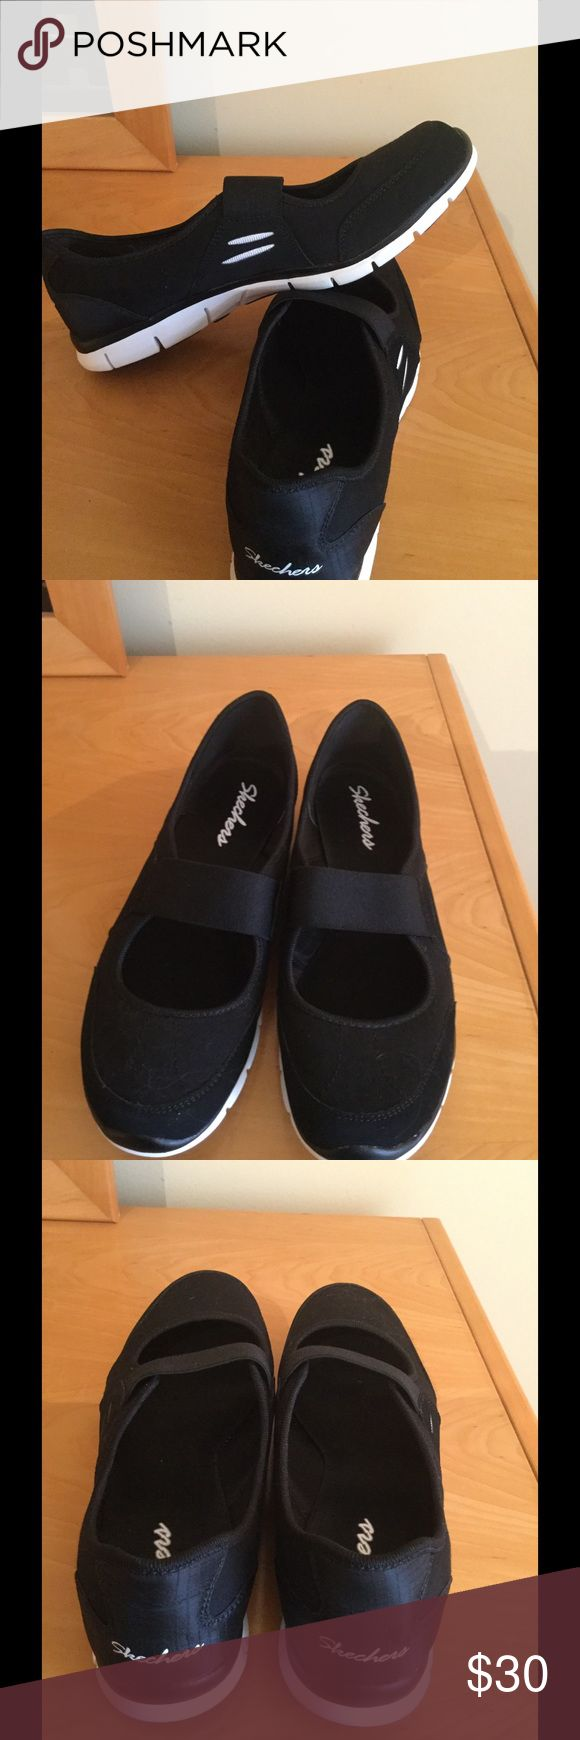 New slip on black Skechers Sz 8 New Sz 8 black slip on Skechers . No box Skechers Shoes Flats & Loafers